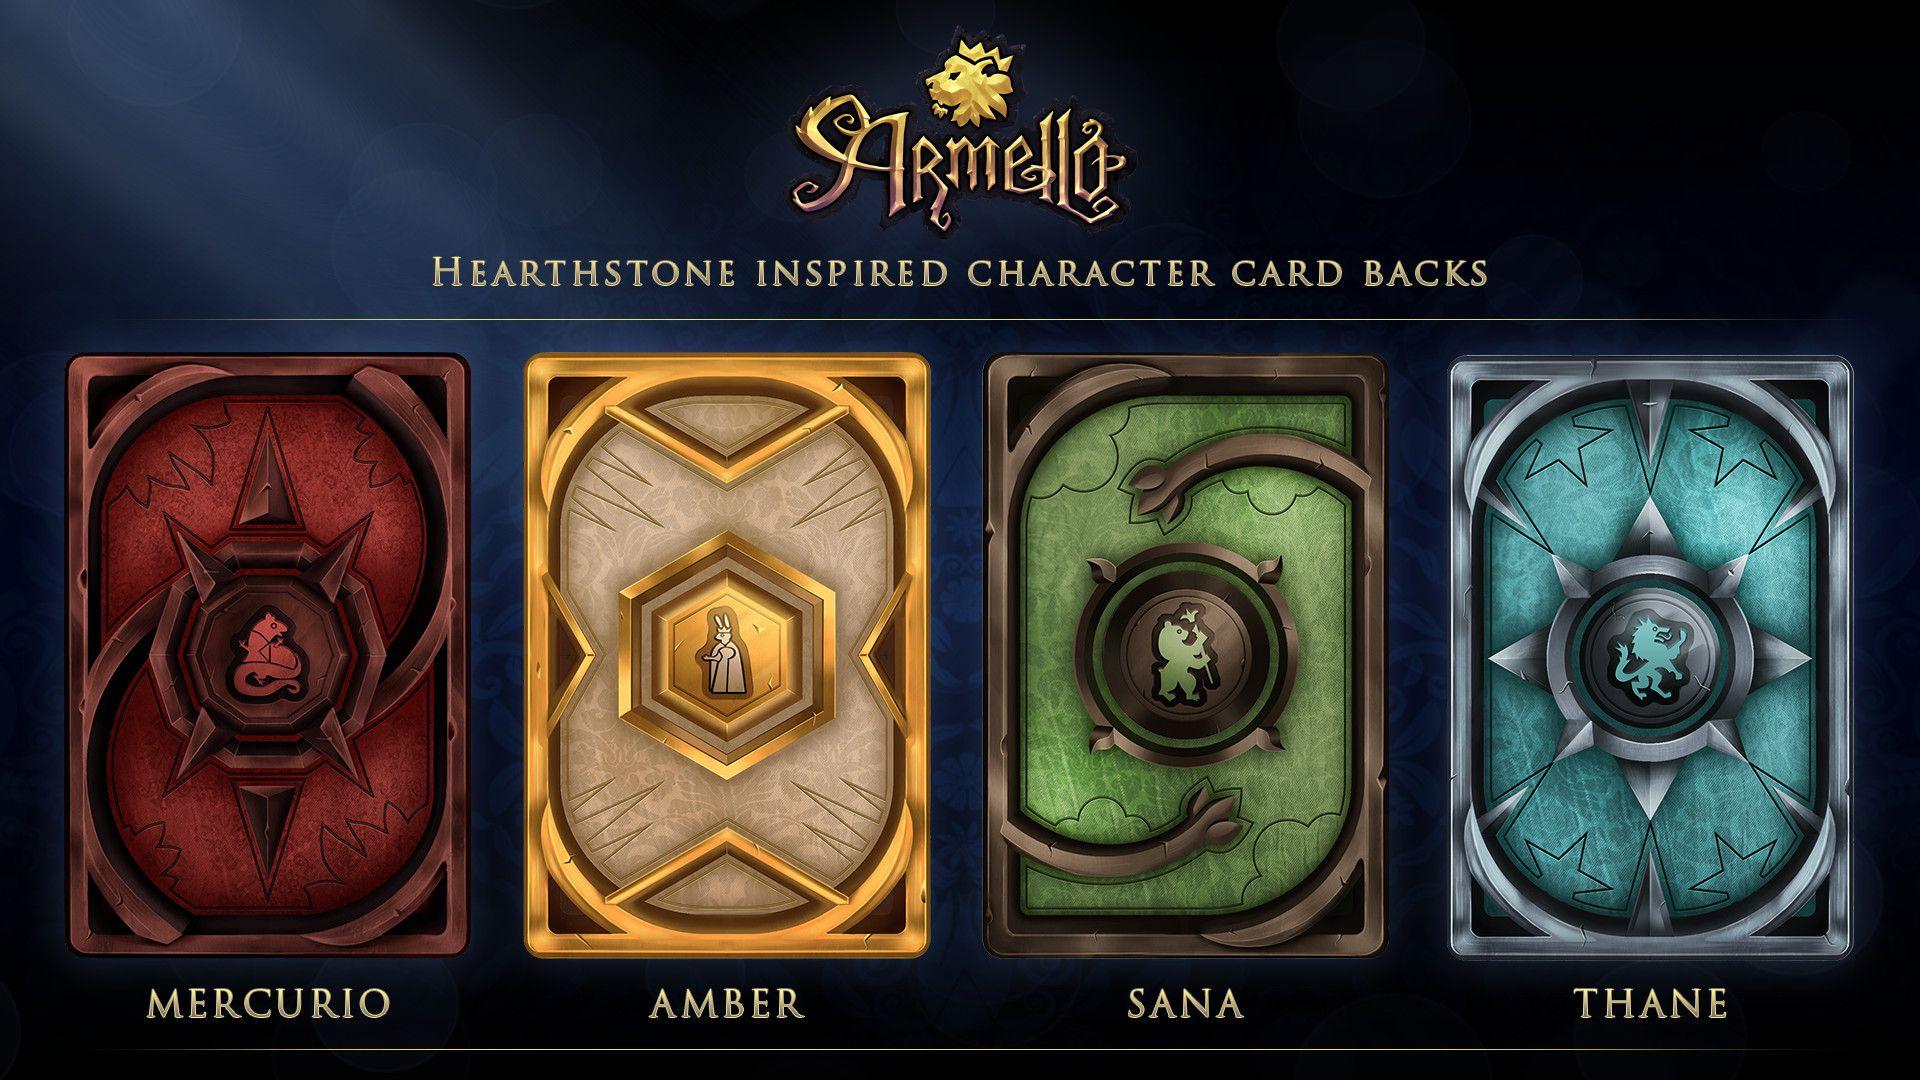 Armello X Hearthstone Card Backs Gavin Bird Game Card Design Card Art Math Card Games